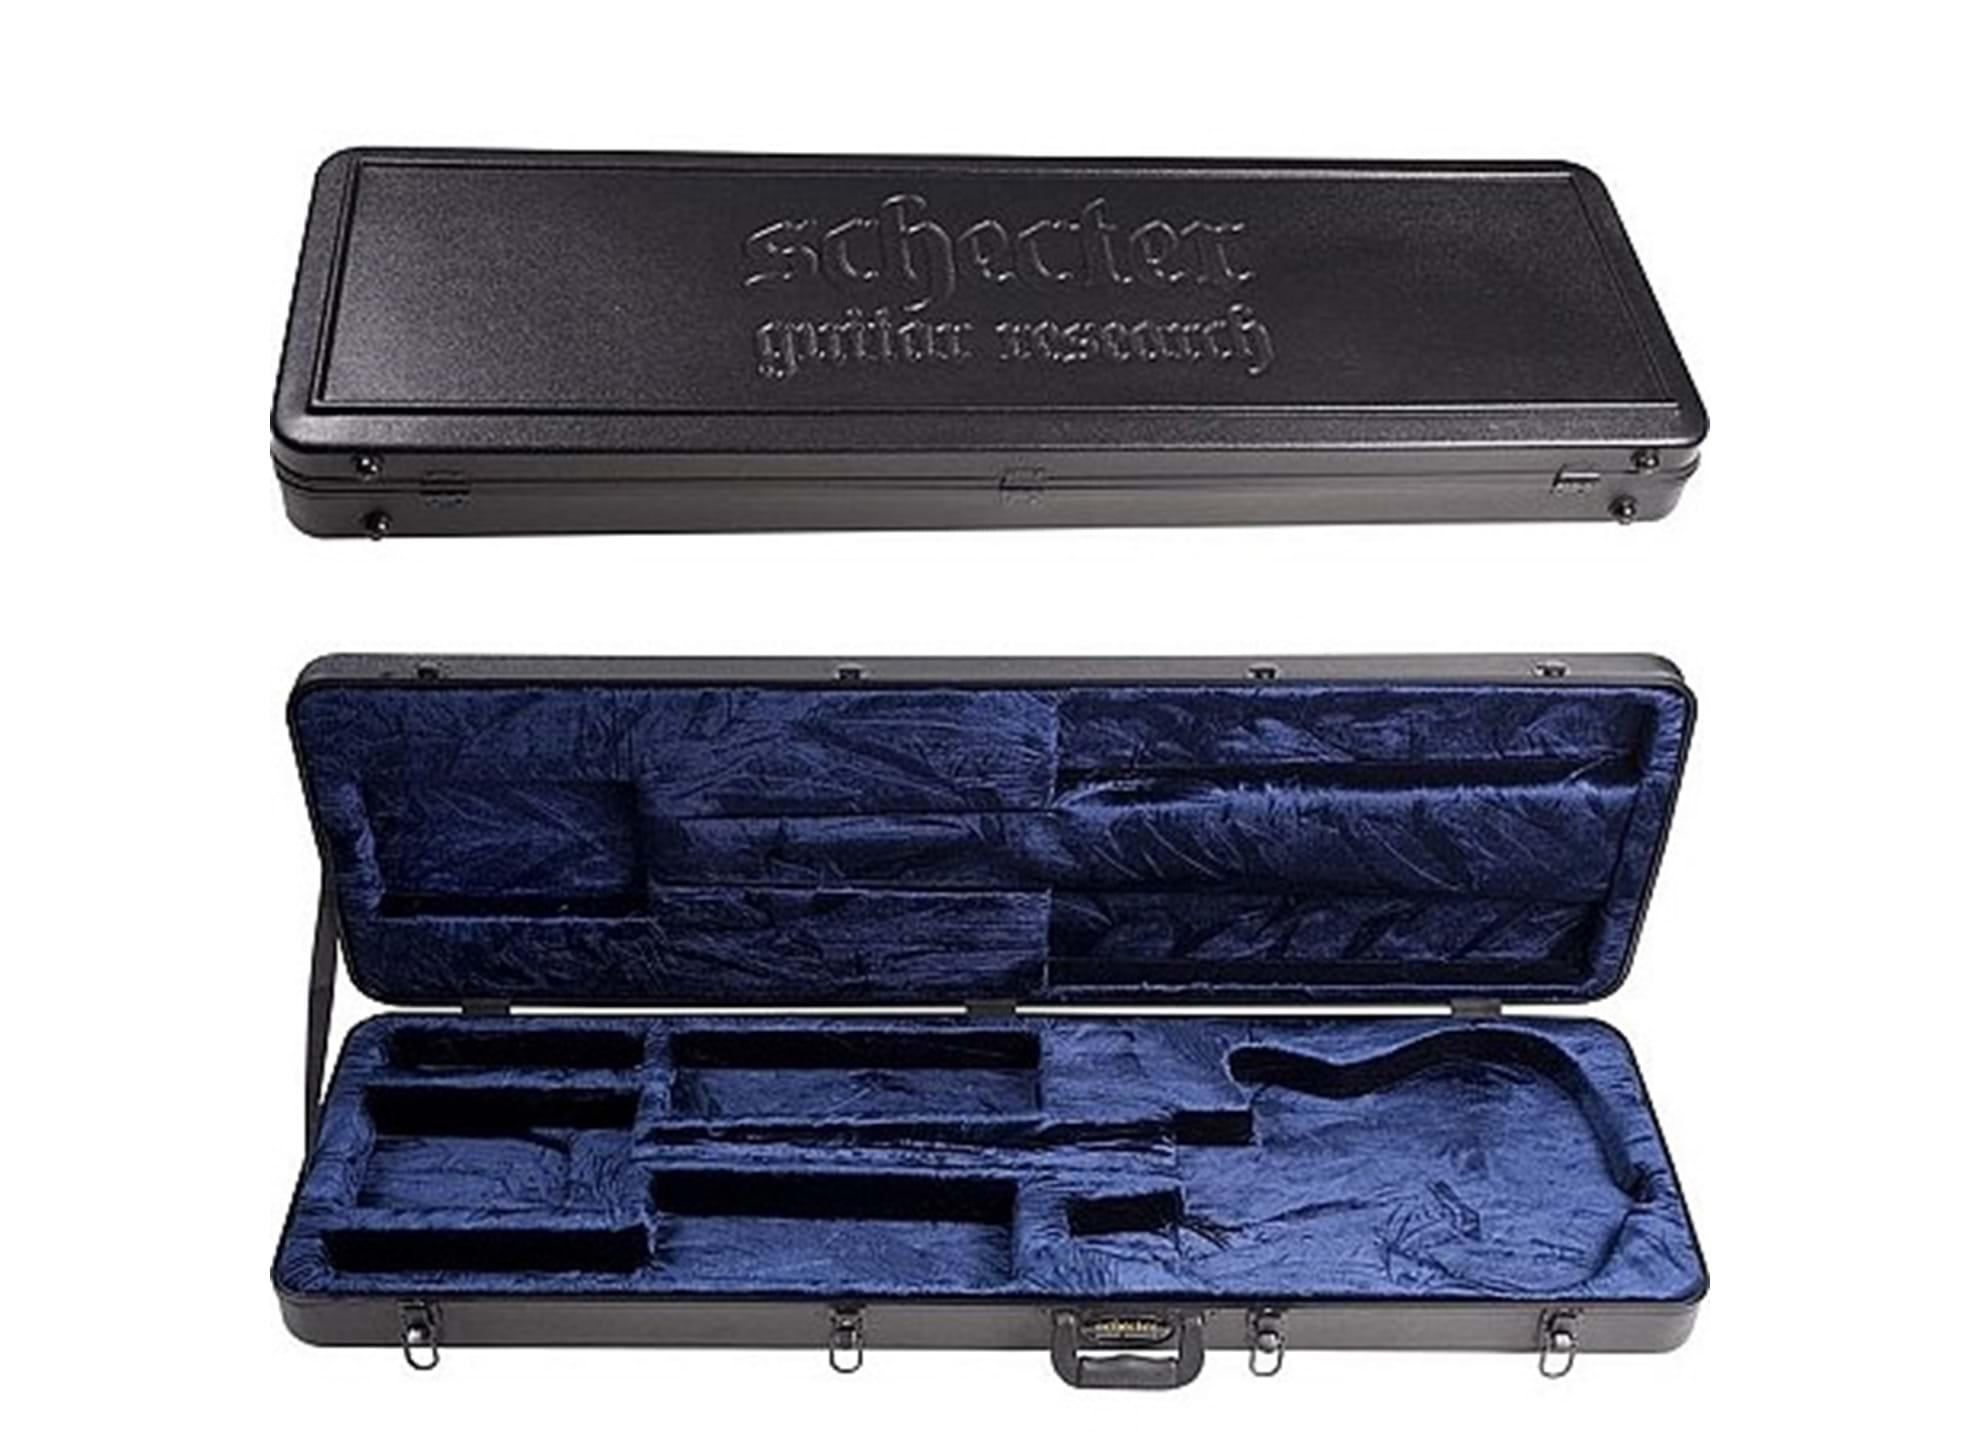 SGR-6B Electric Bass Case (Omen, C-Basses)